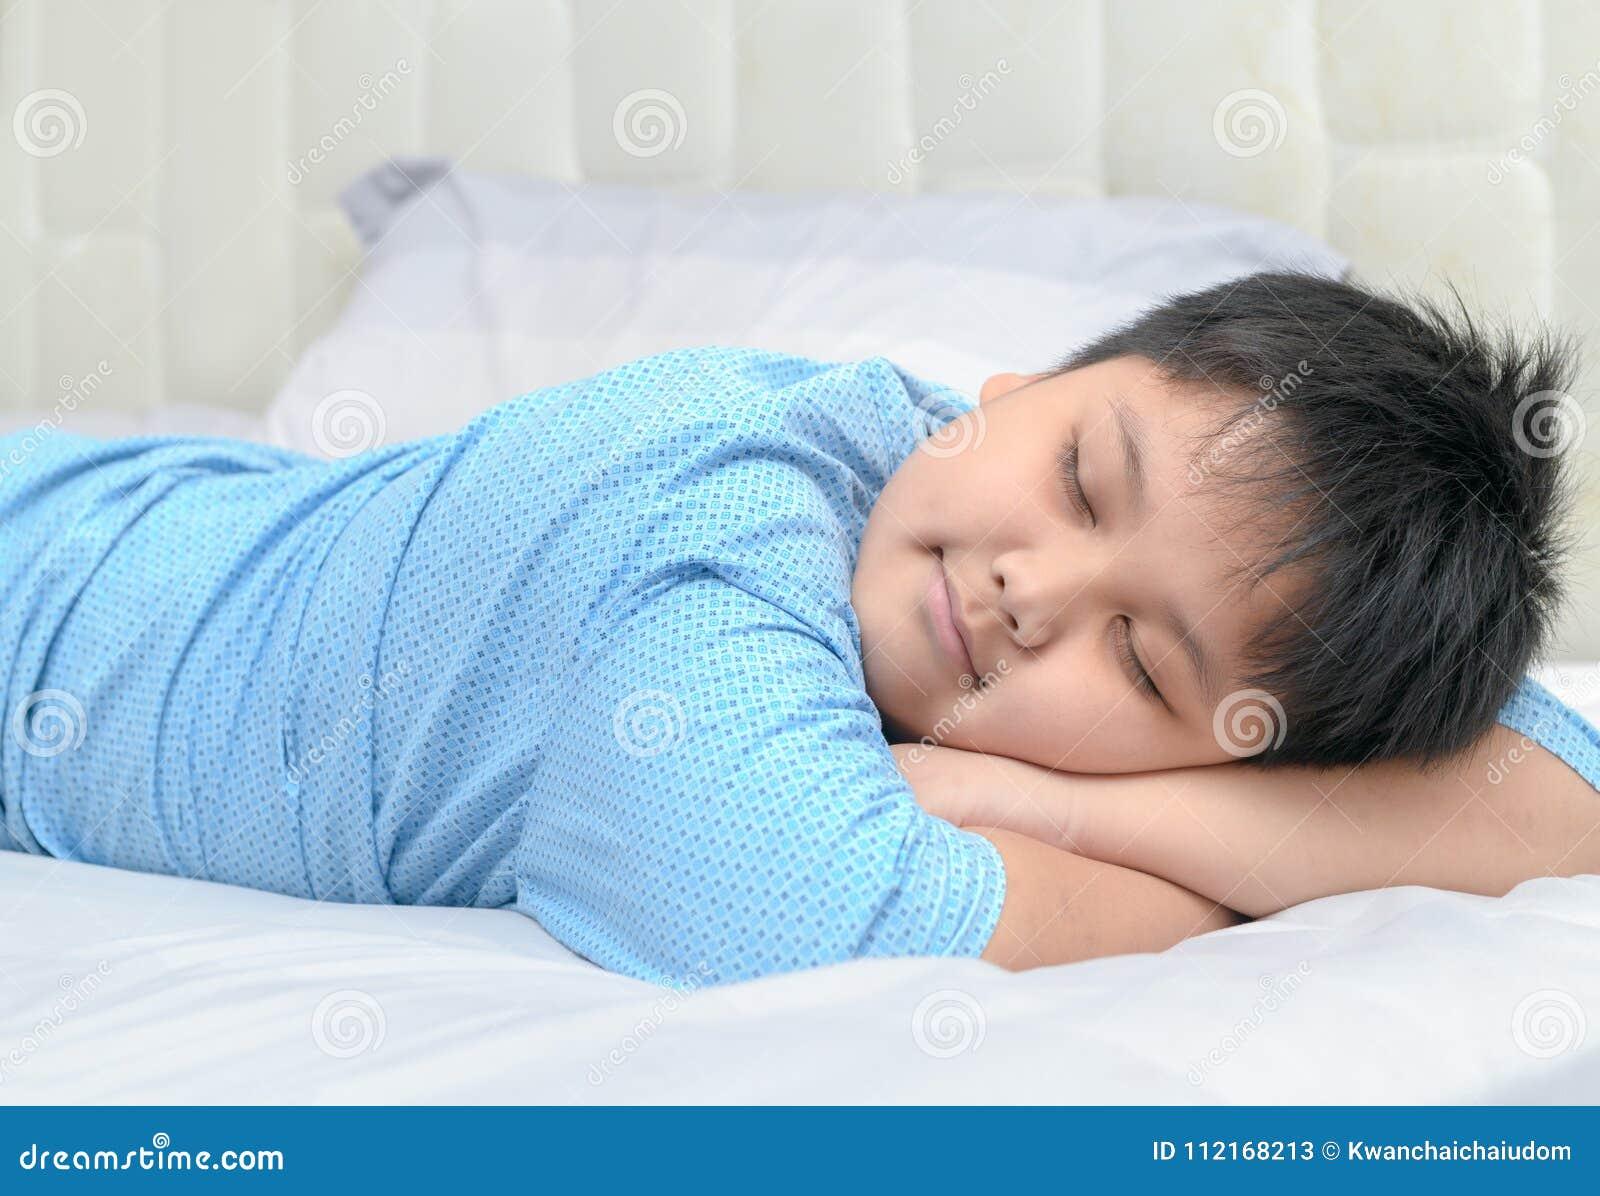 Sueño dulce del muchacho gordo obeso en su brazo